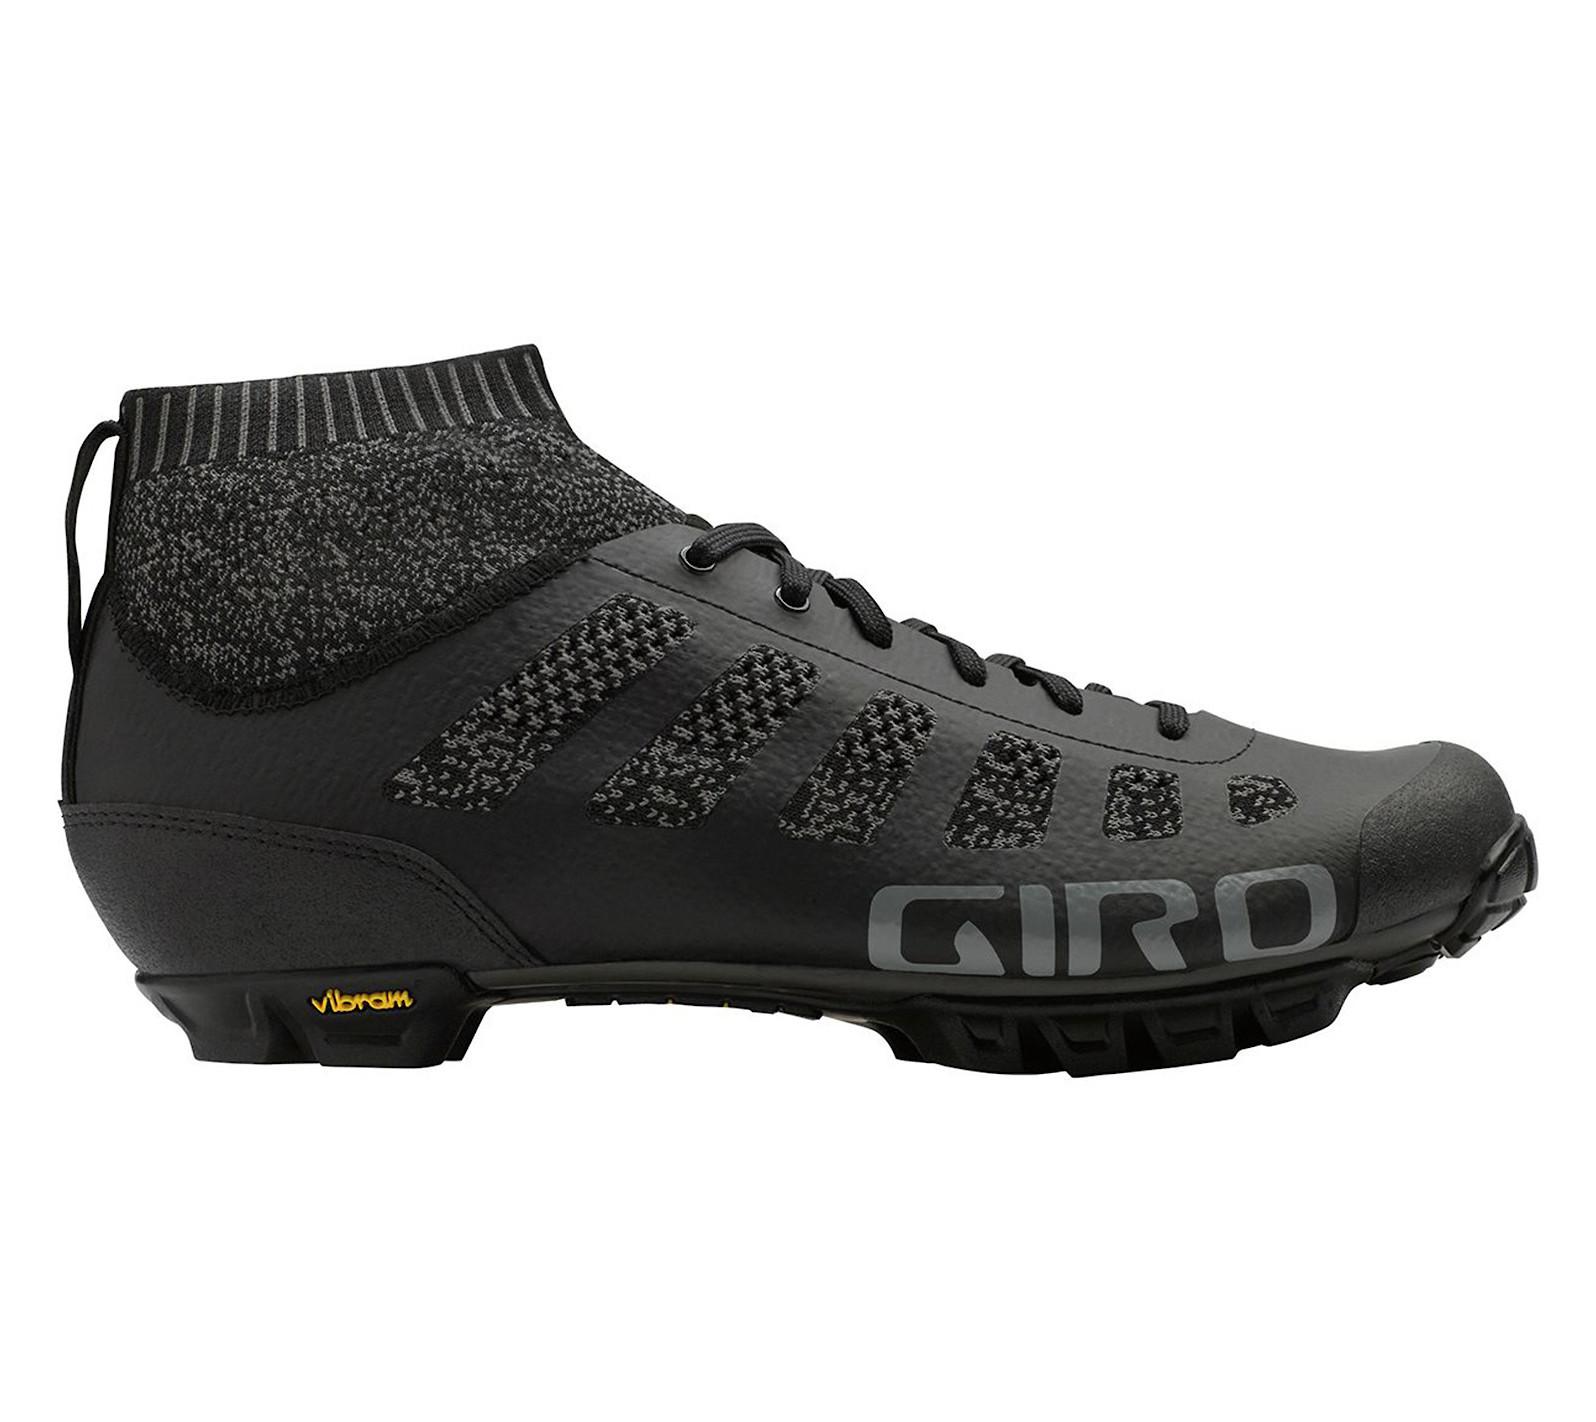 Giro Empire VR70 Knit (Black/Charcoal)